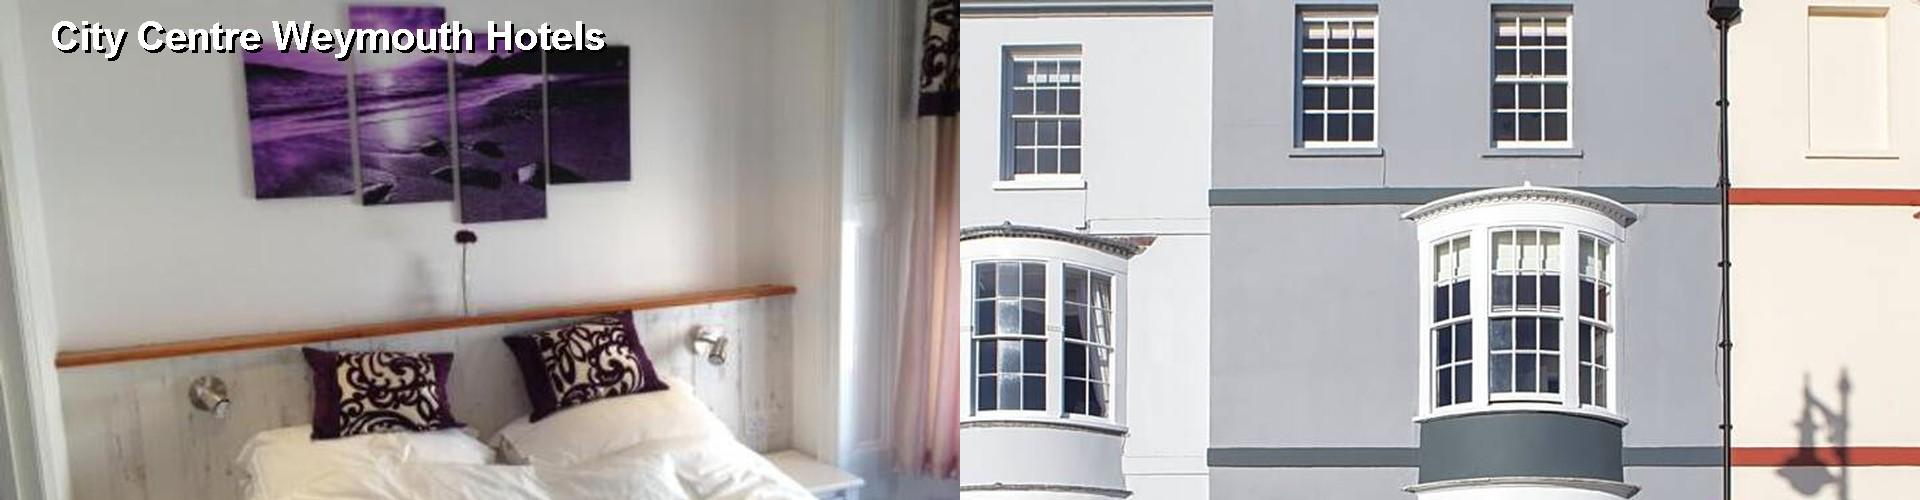 5 Best Hotels Near City Centre Weymouth